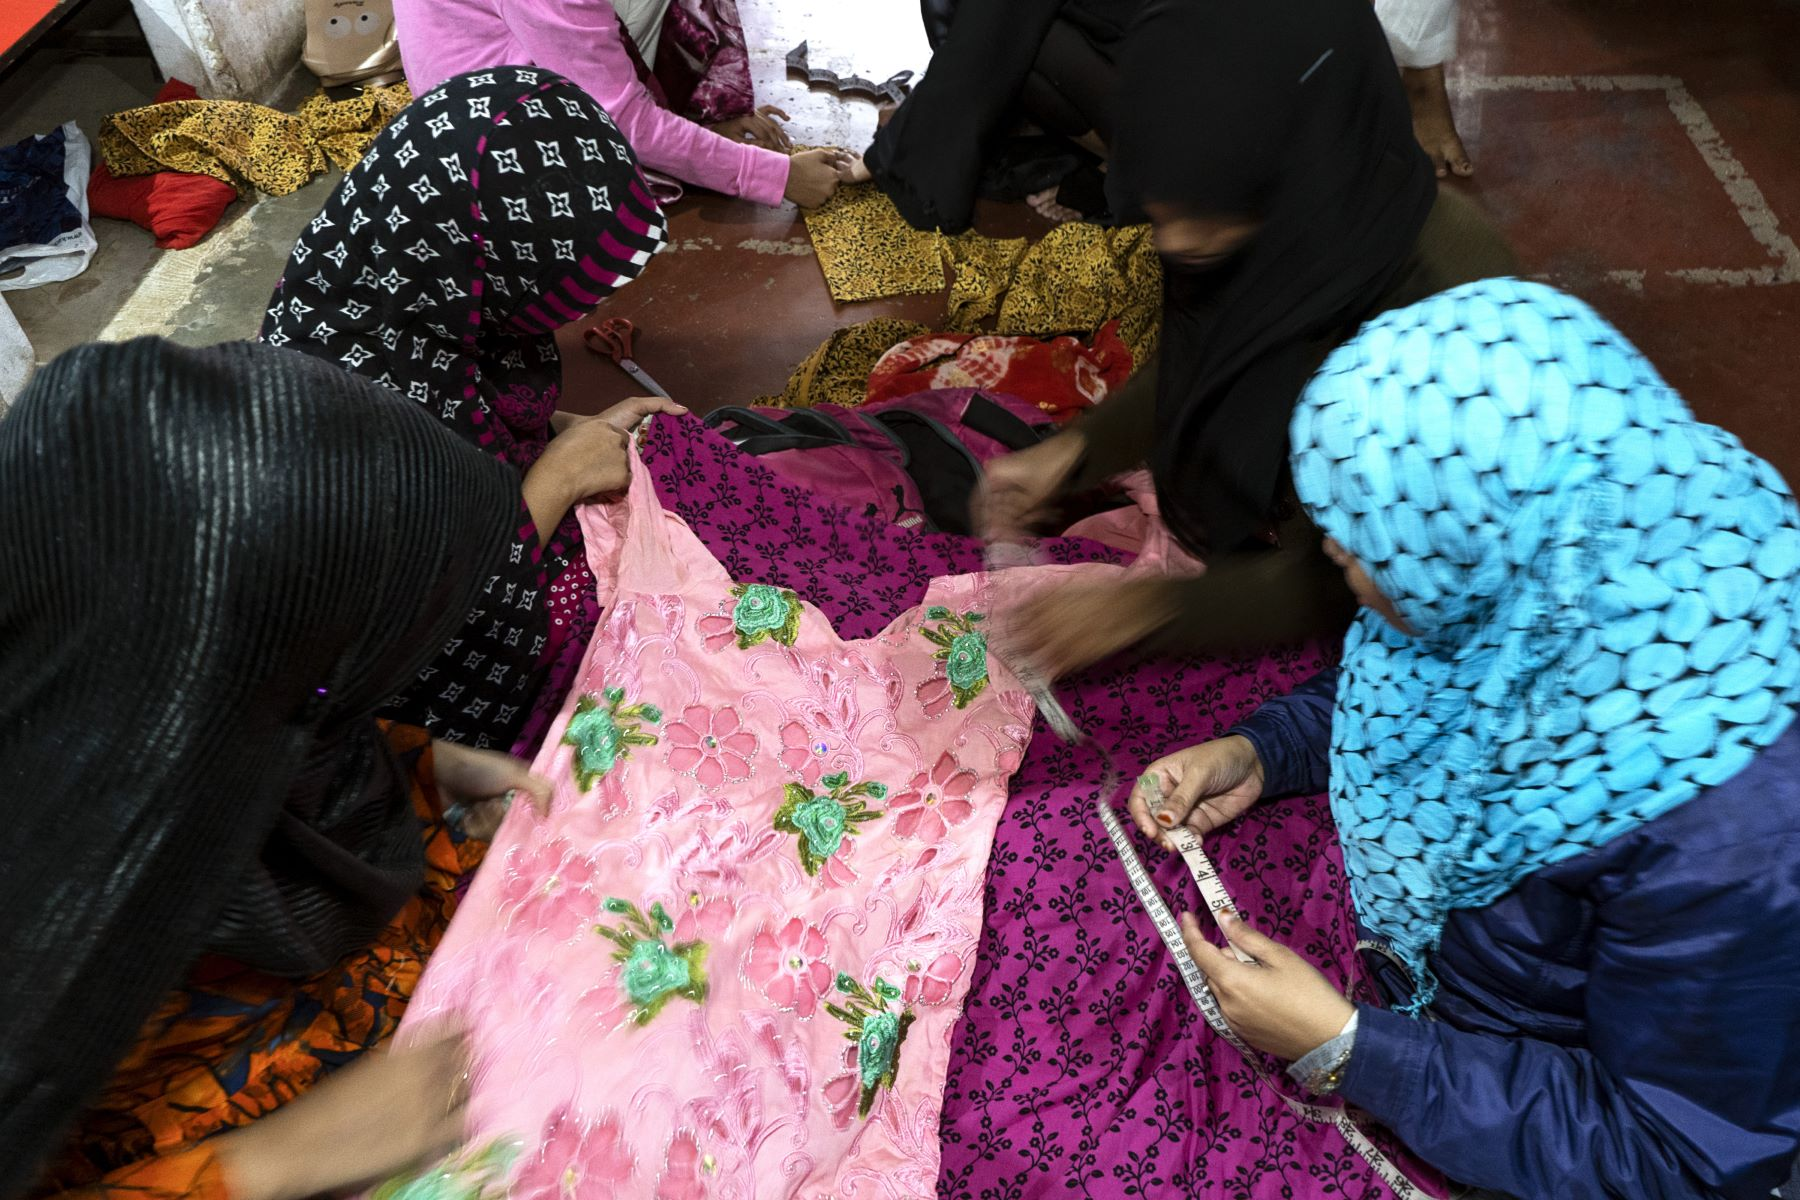 Fabric measurement and stitching at Eka's skill development workshop